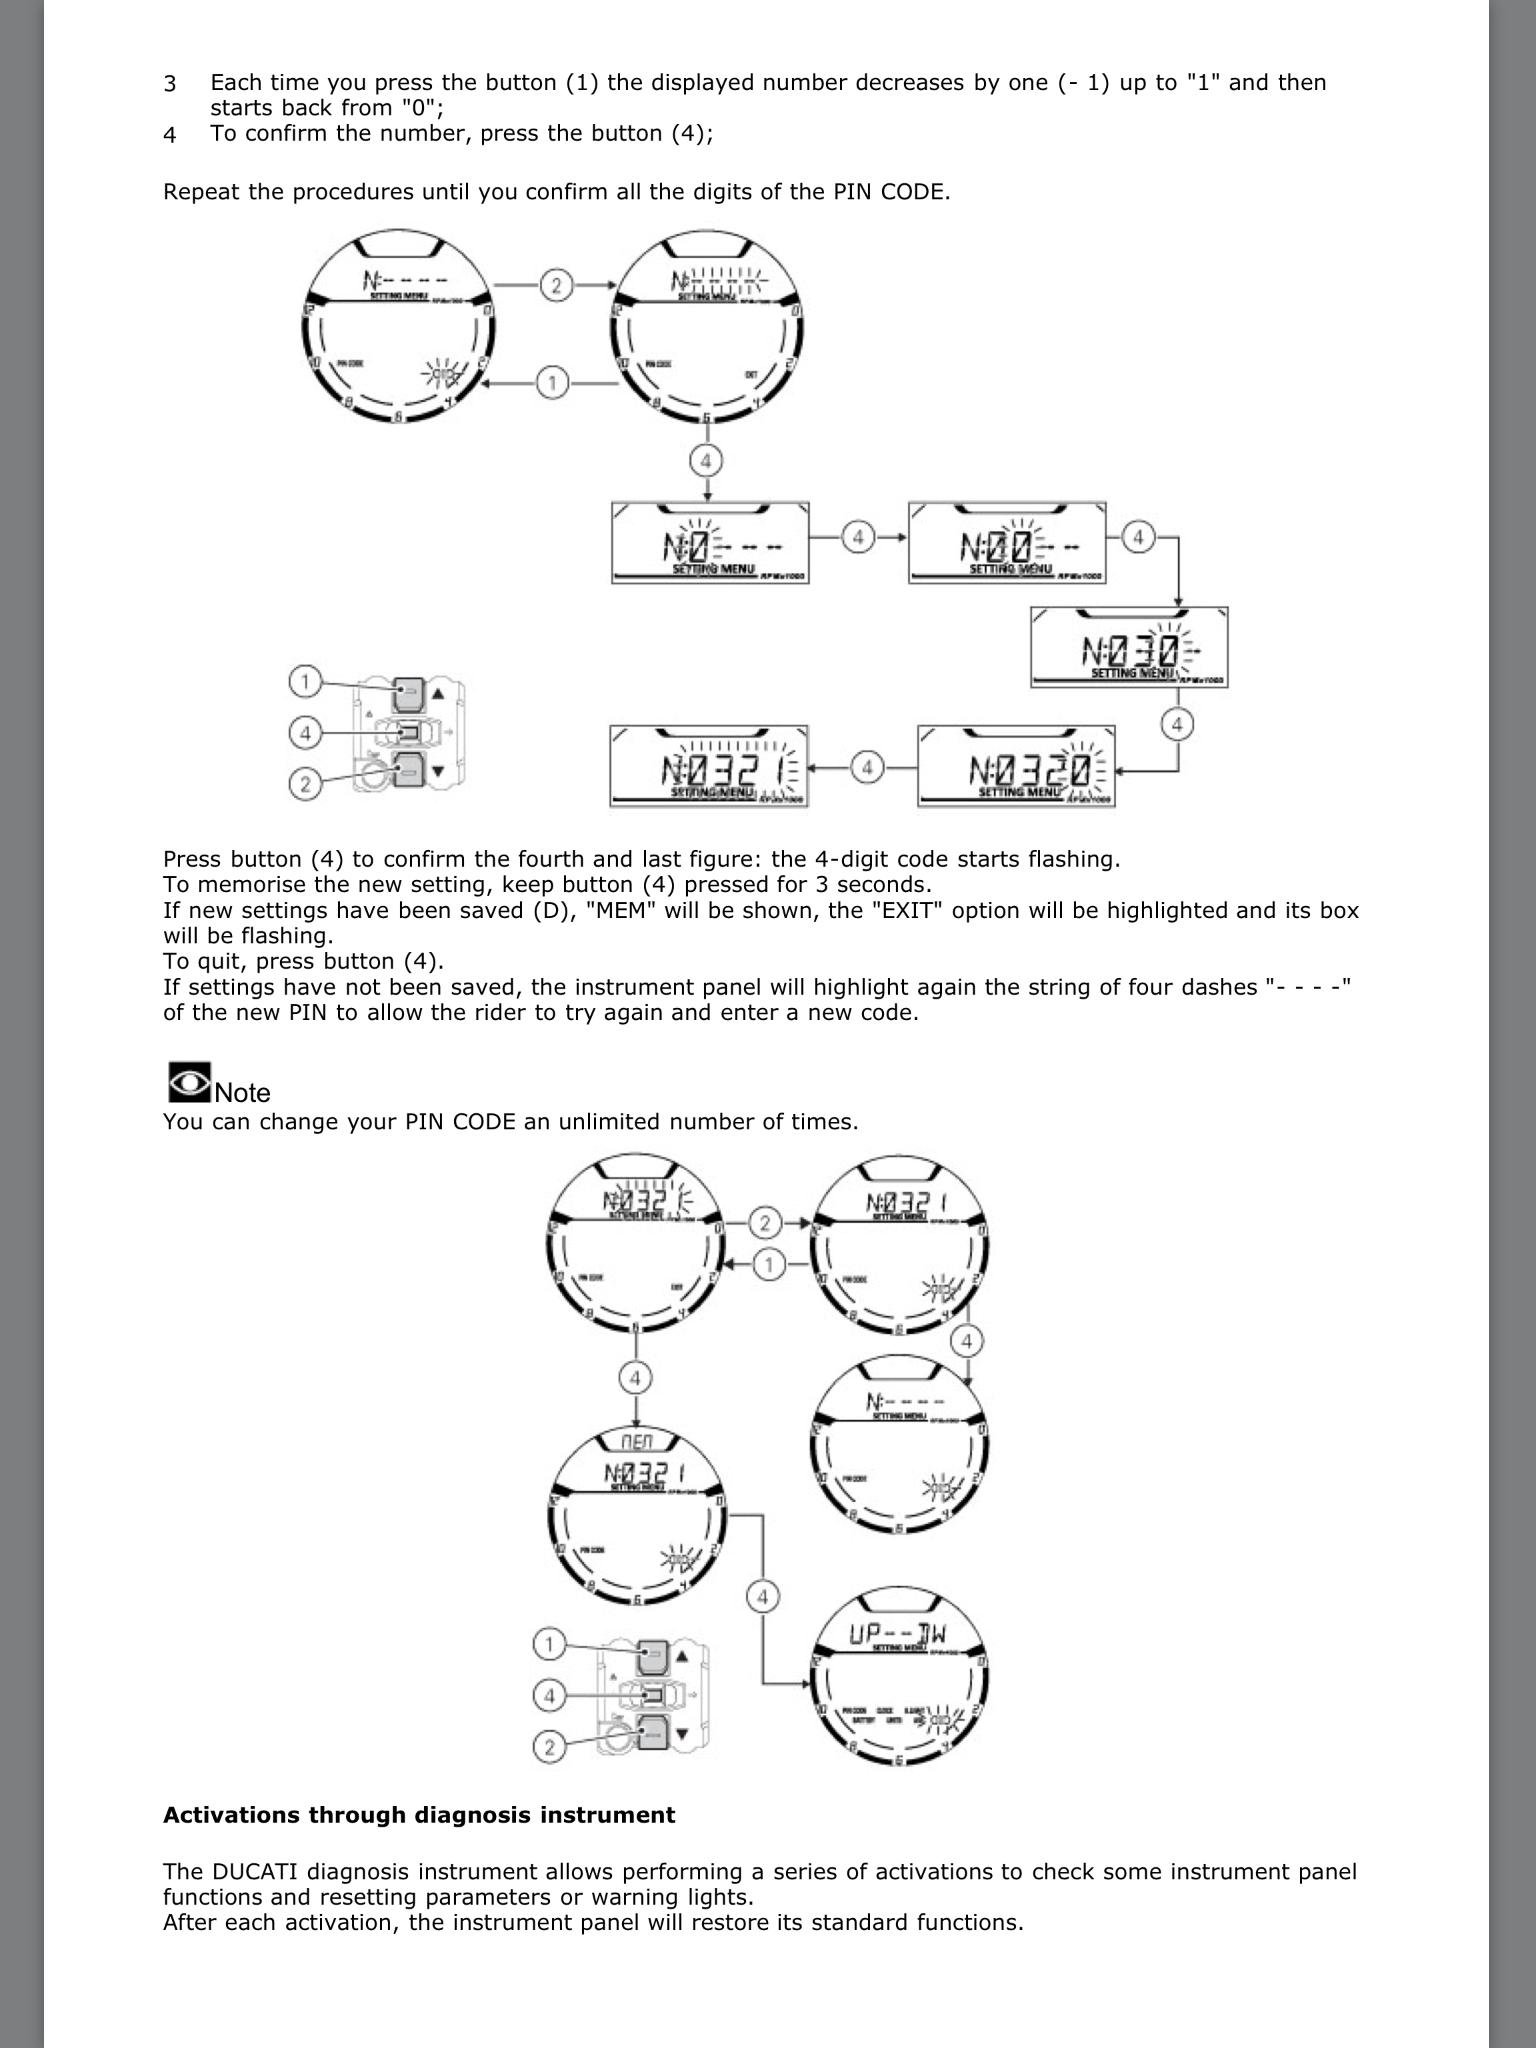 Resetting pin code | Ducati Scrambler Forum